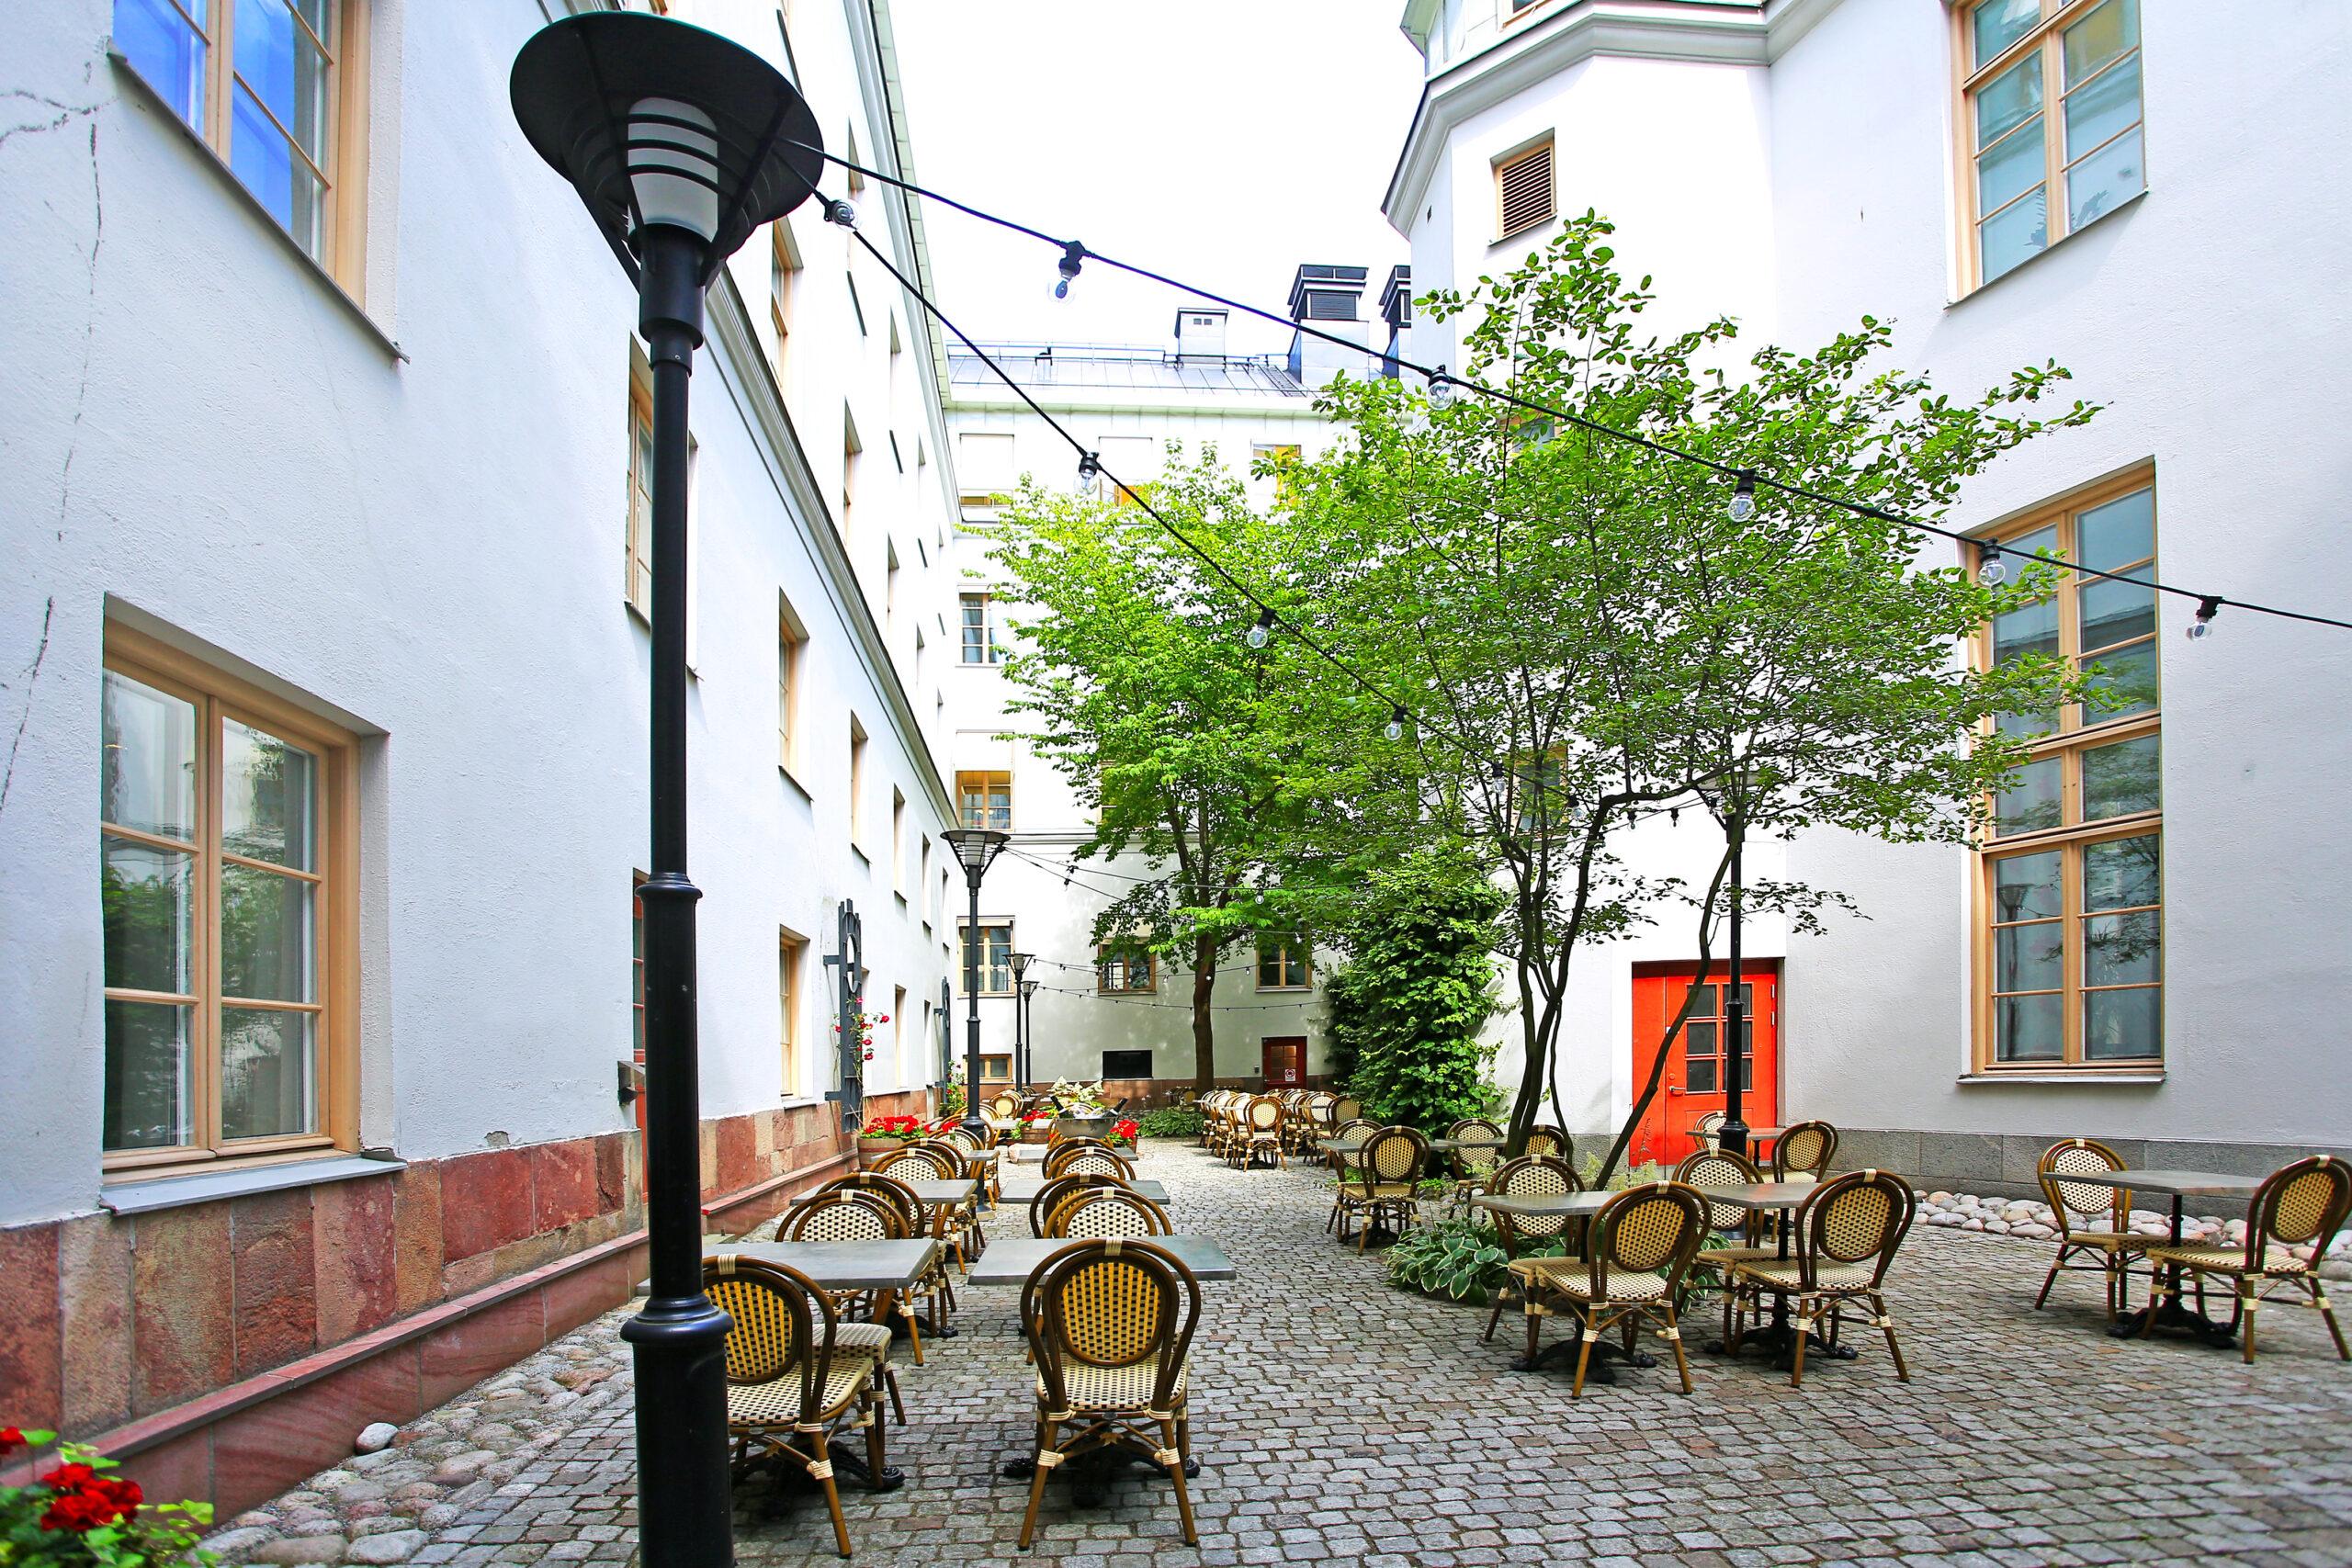 innergård westmanska palatset